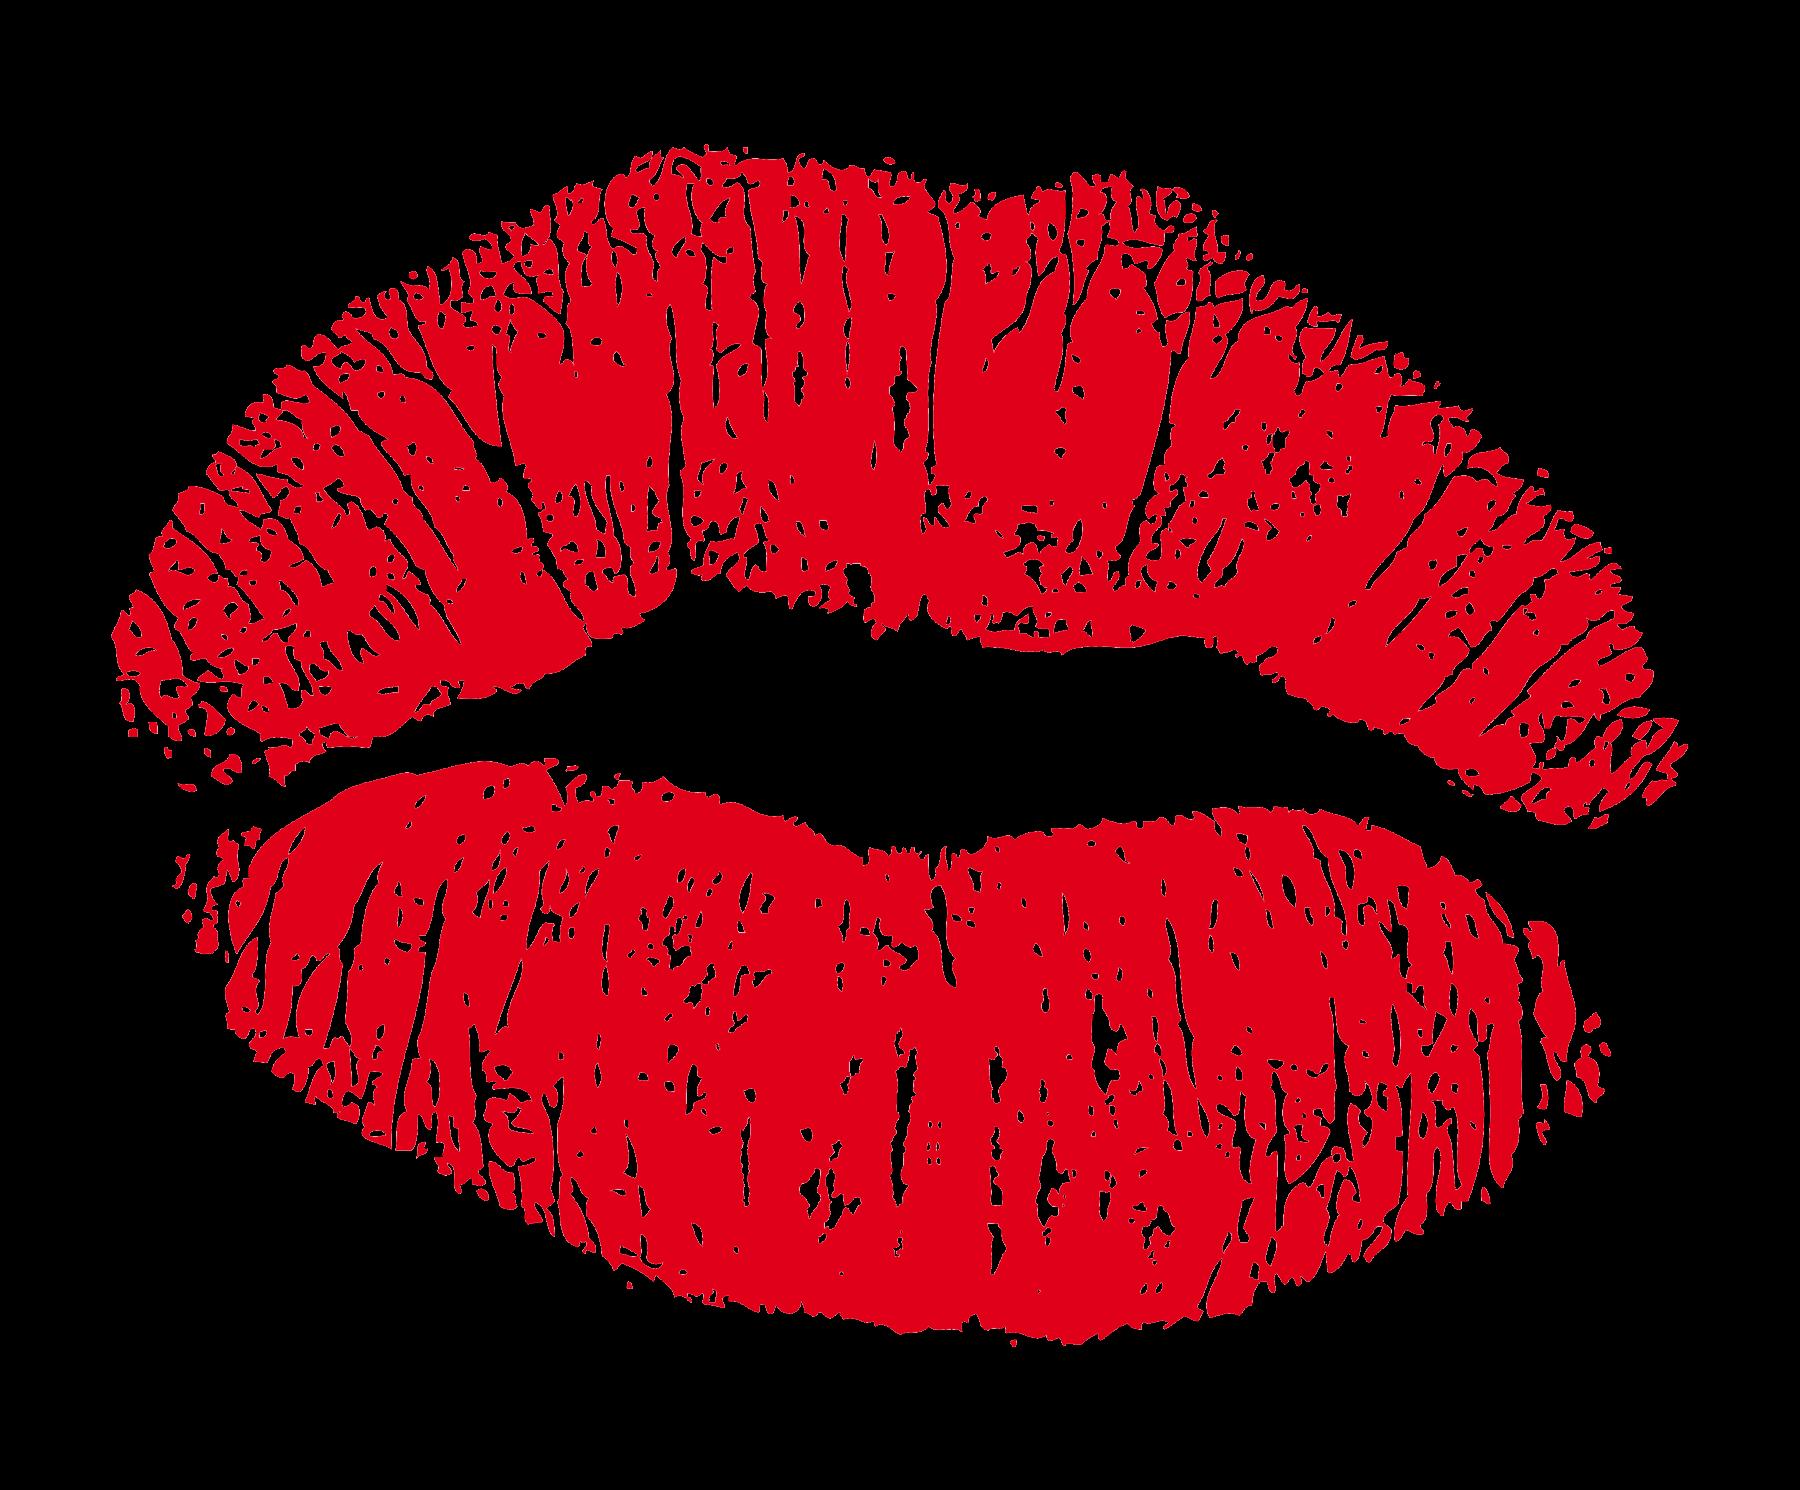 /var/www/html/wp-content/uploads/2018/10/Kiss_PNG_Image_40683